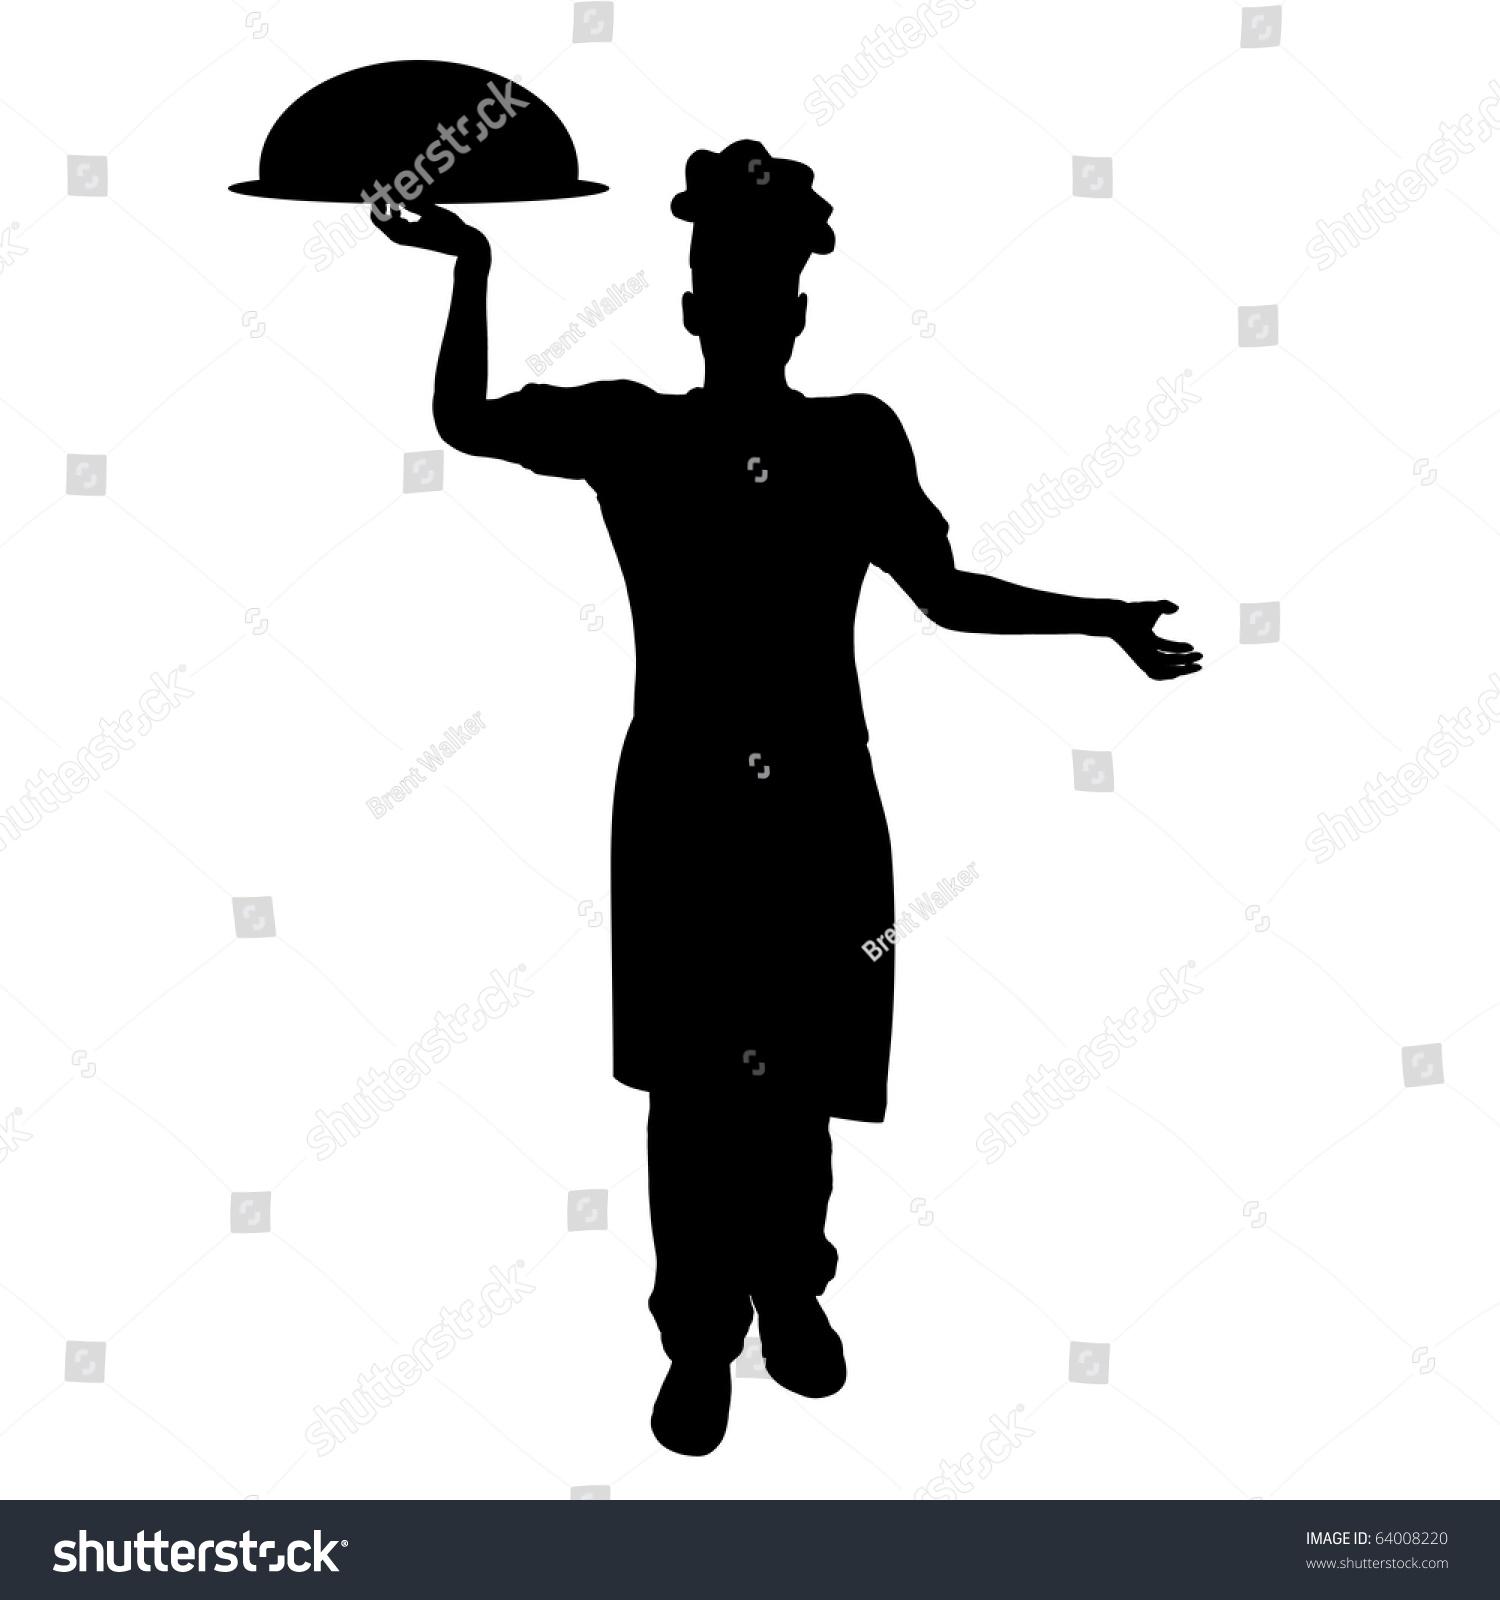 Chef Silhouette Illustration - 64008220 : Shutterstock